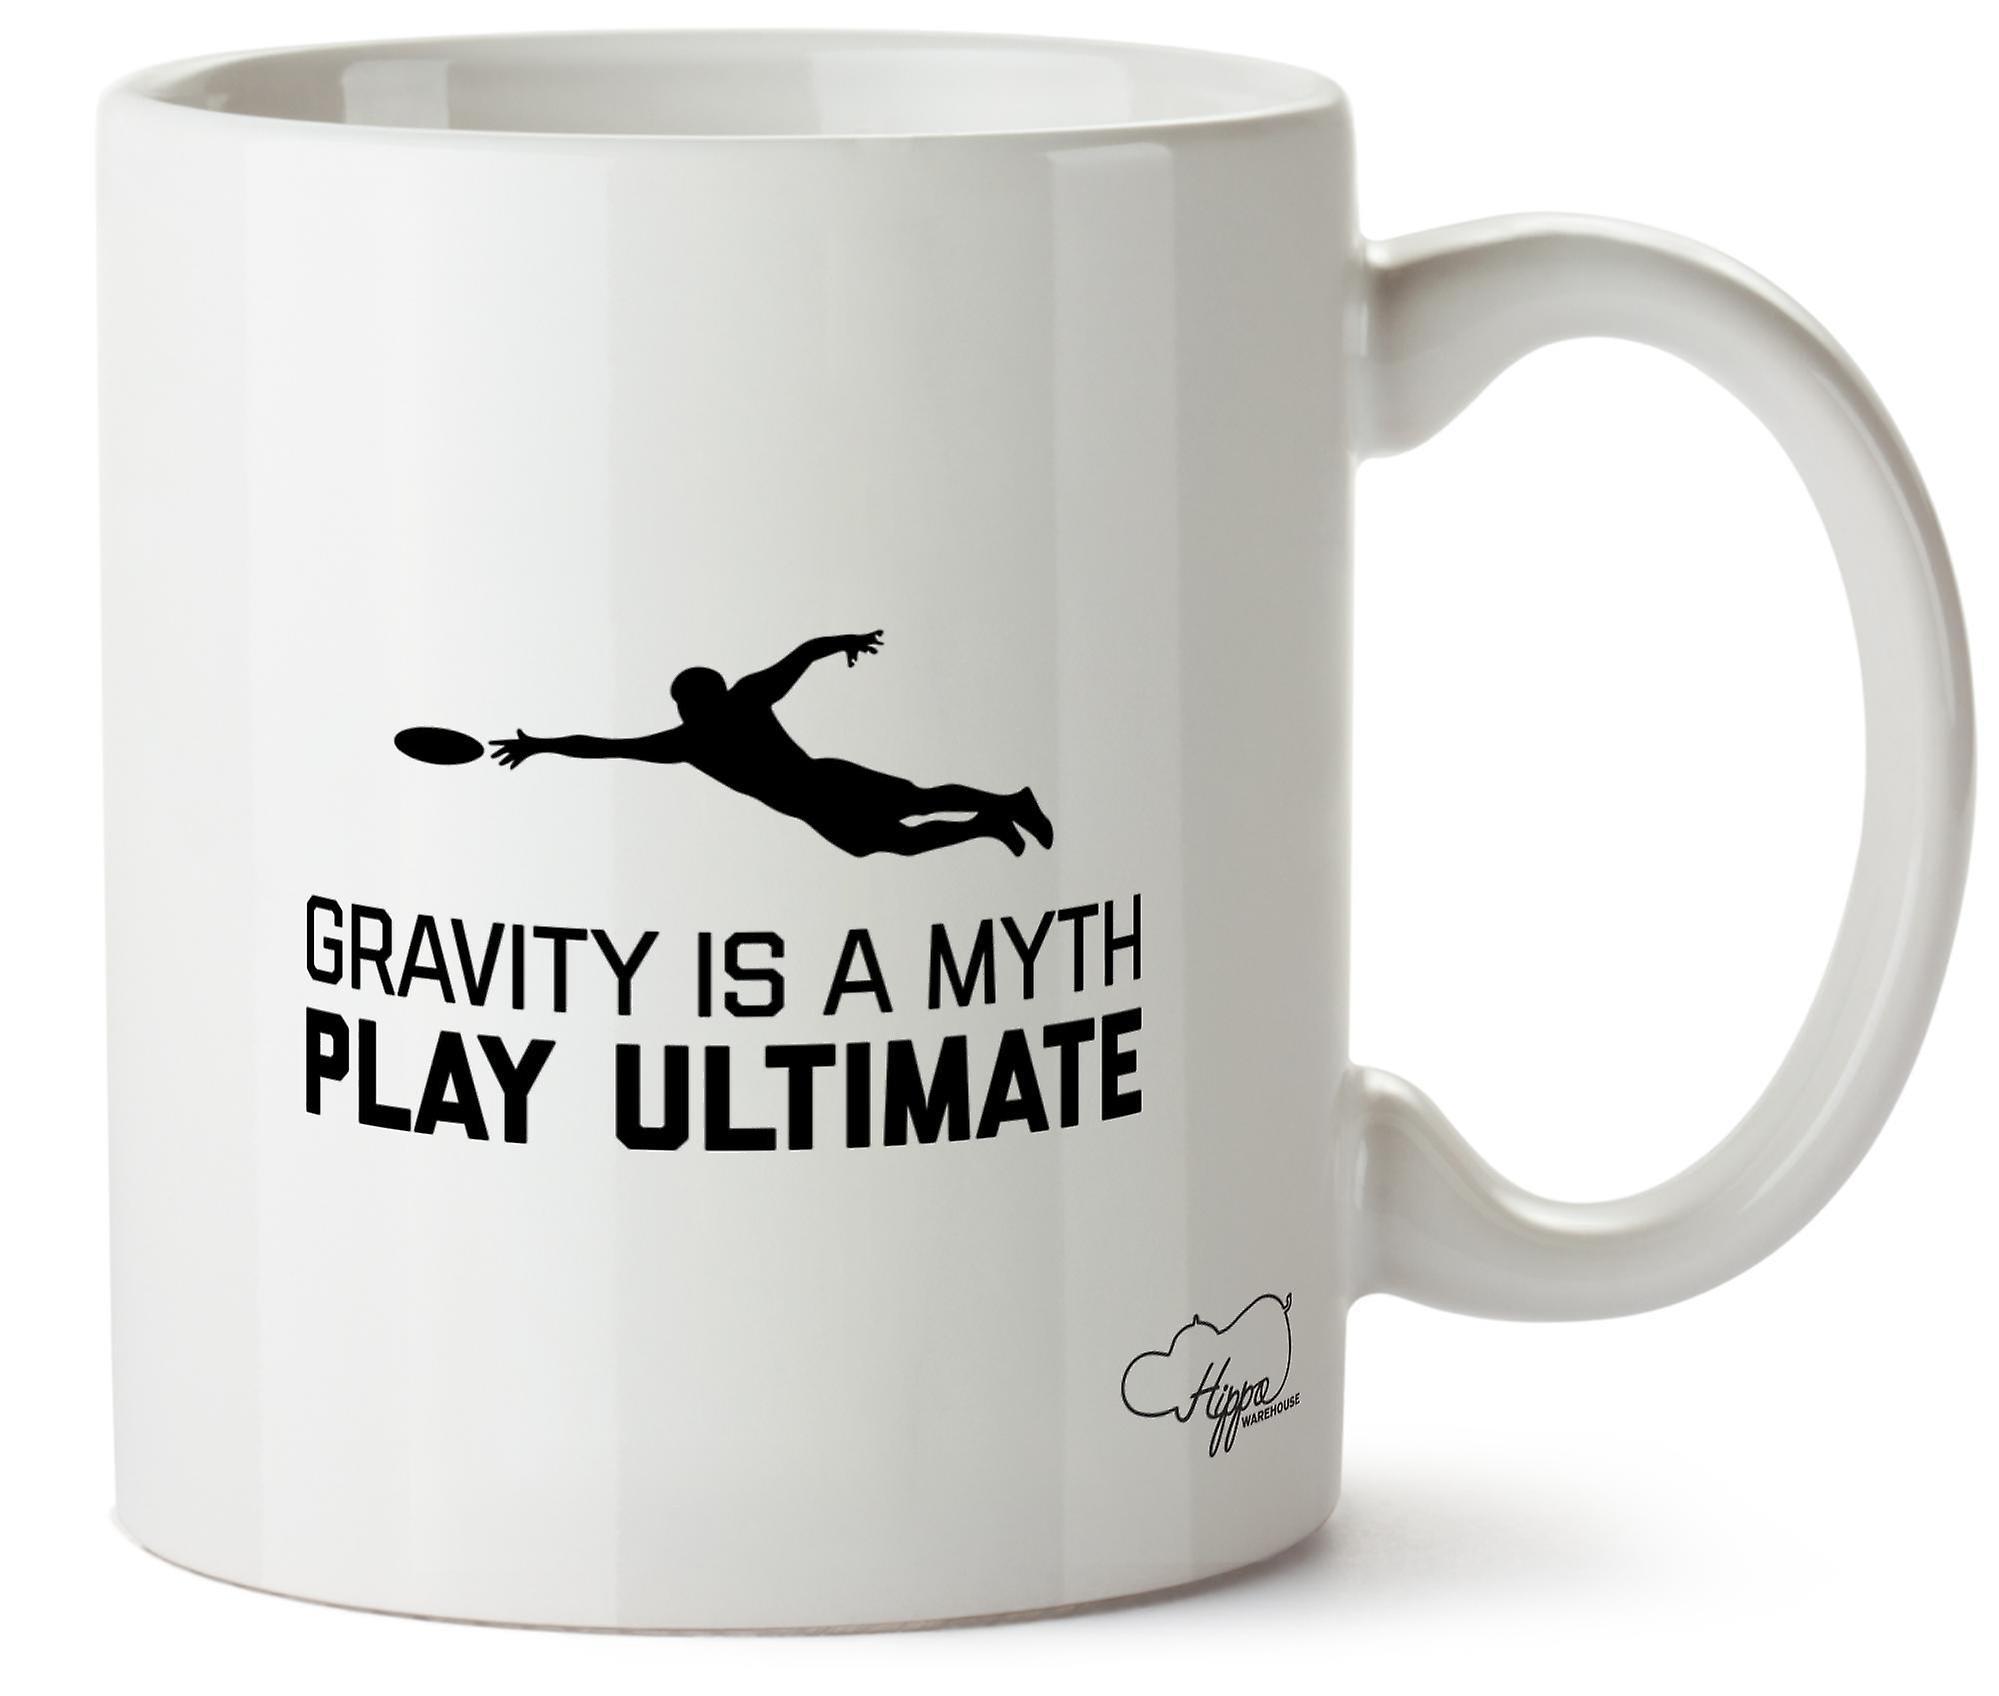 Hippowarehouse Gravity Is A Myth Play Ultimate Printed Mug Cup Ceramic 10oz